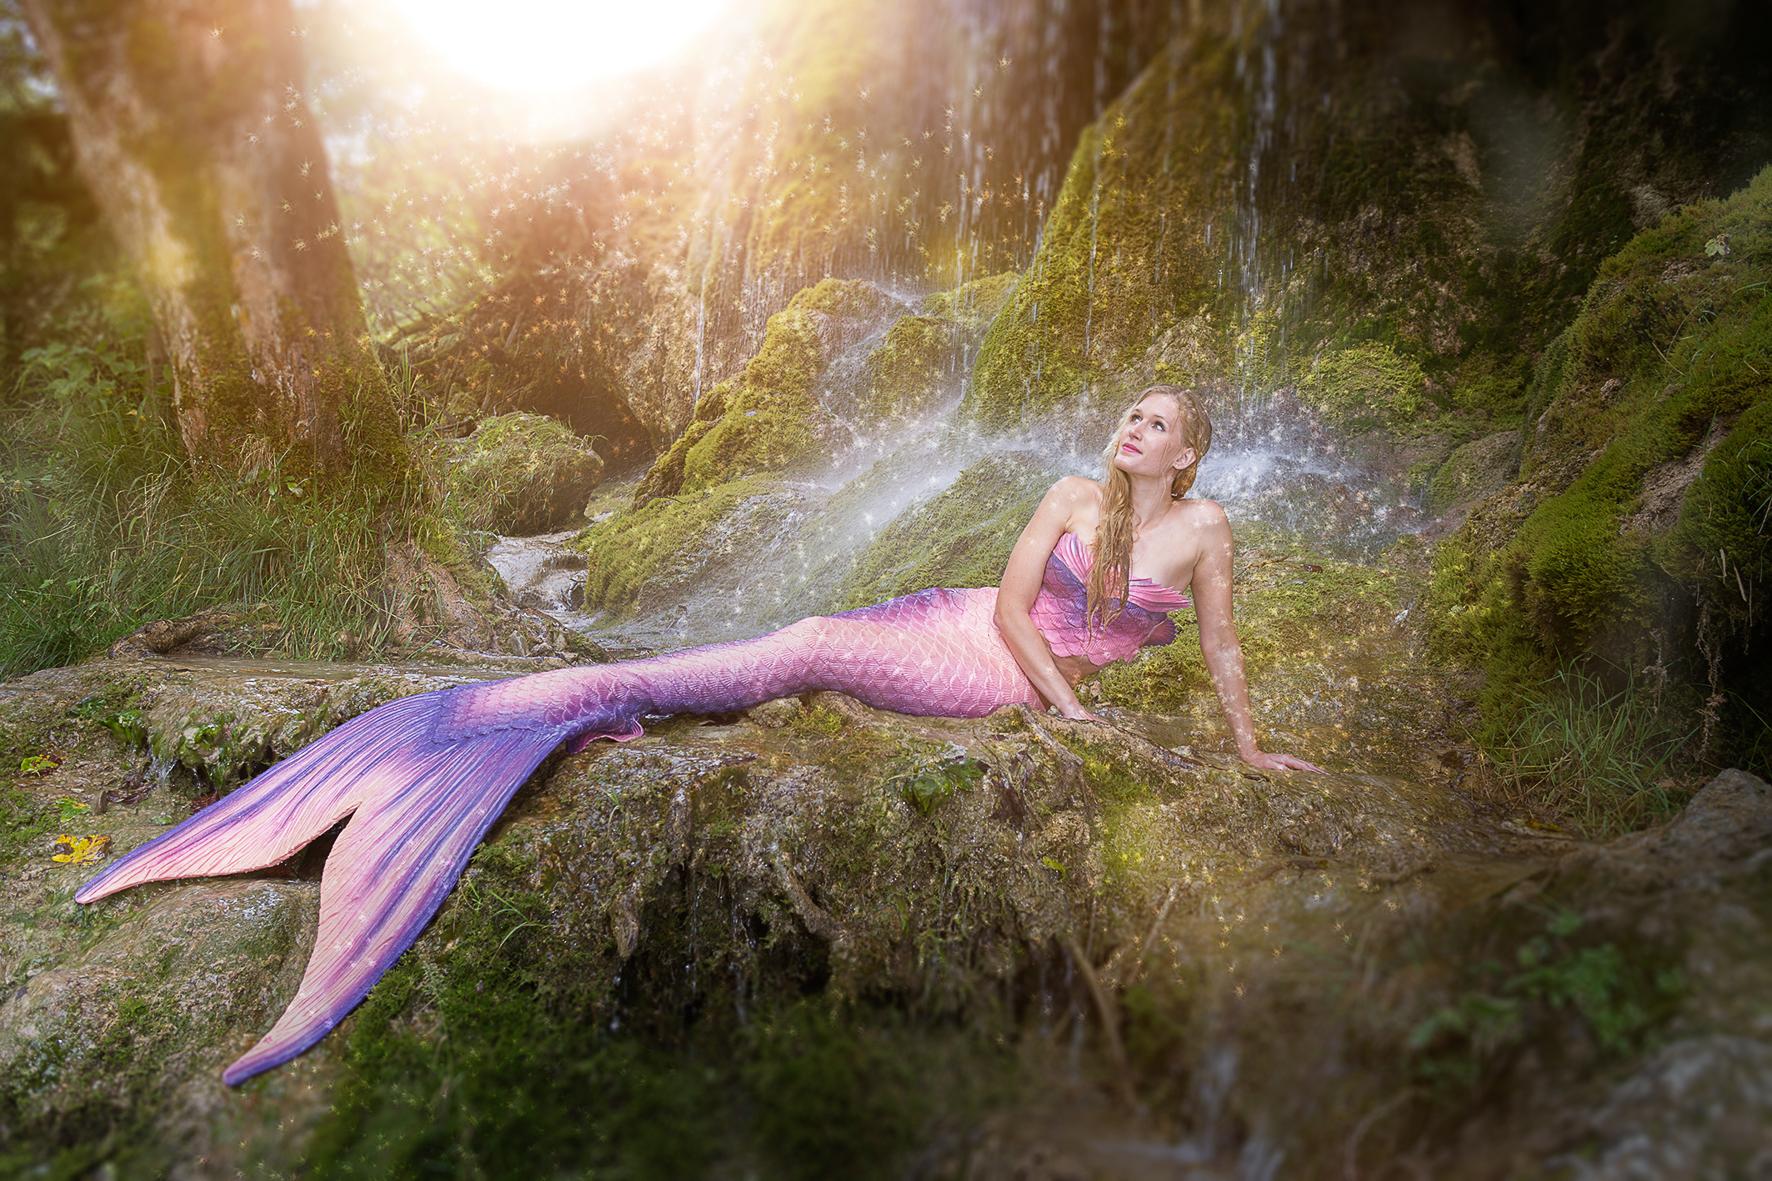 Mermaid4you - Denise Nemec